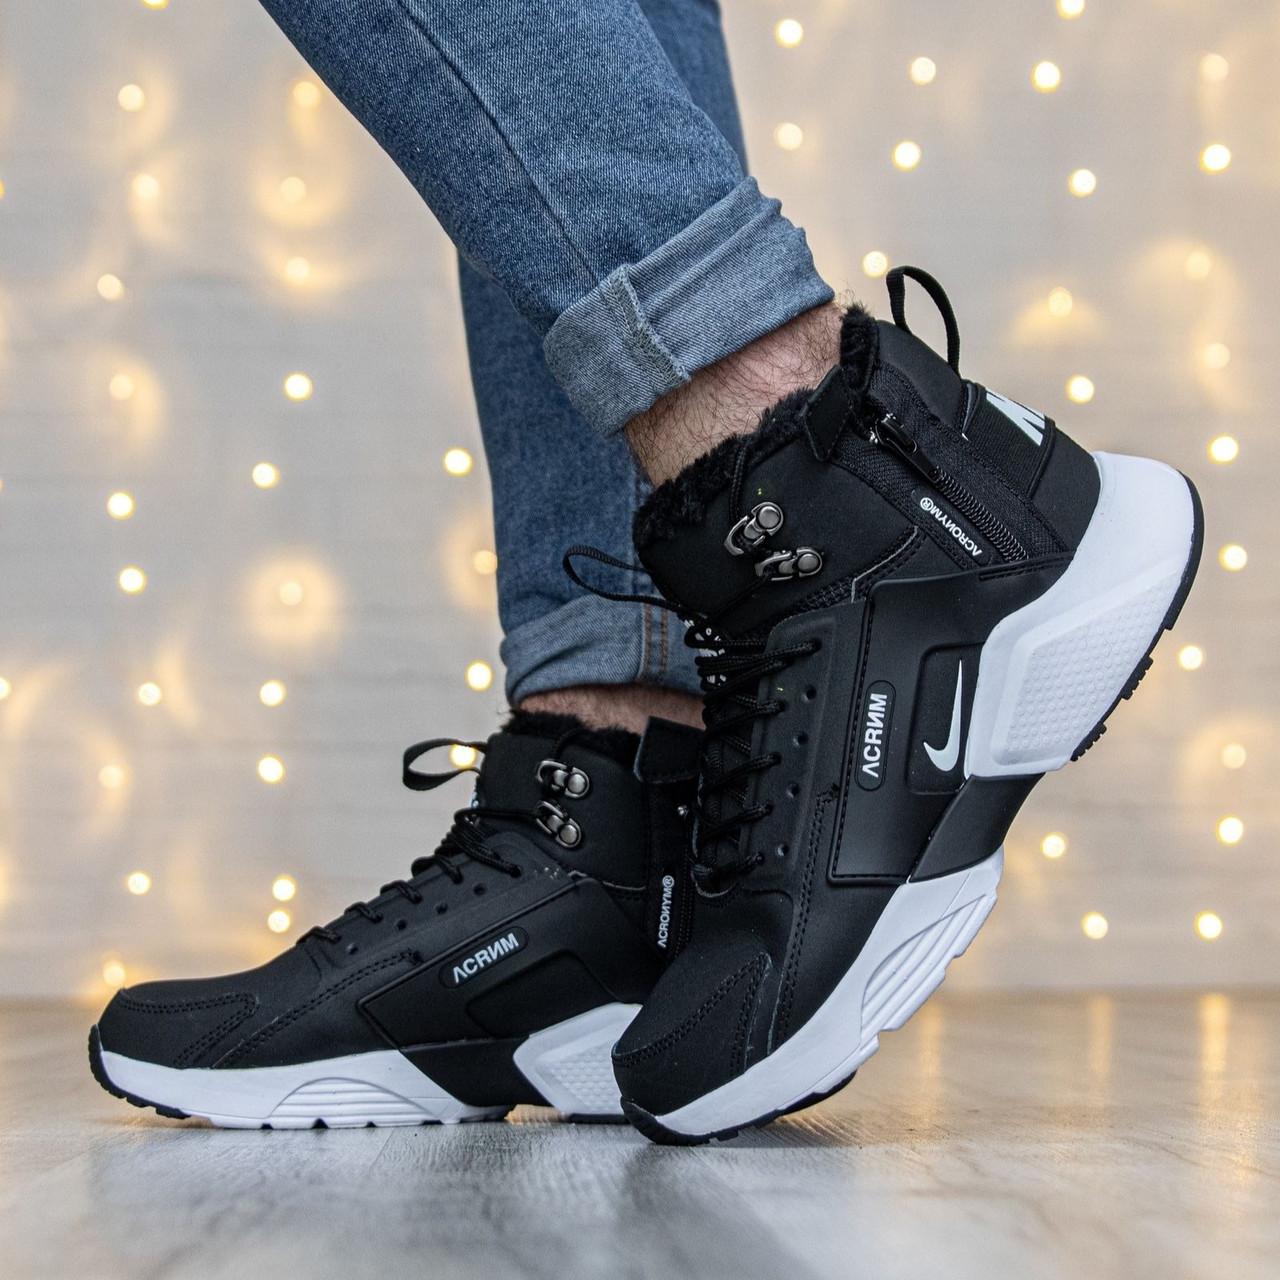 Мужские зимние кроссовки в стиле Nike Huarache x Acronym с мехом